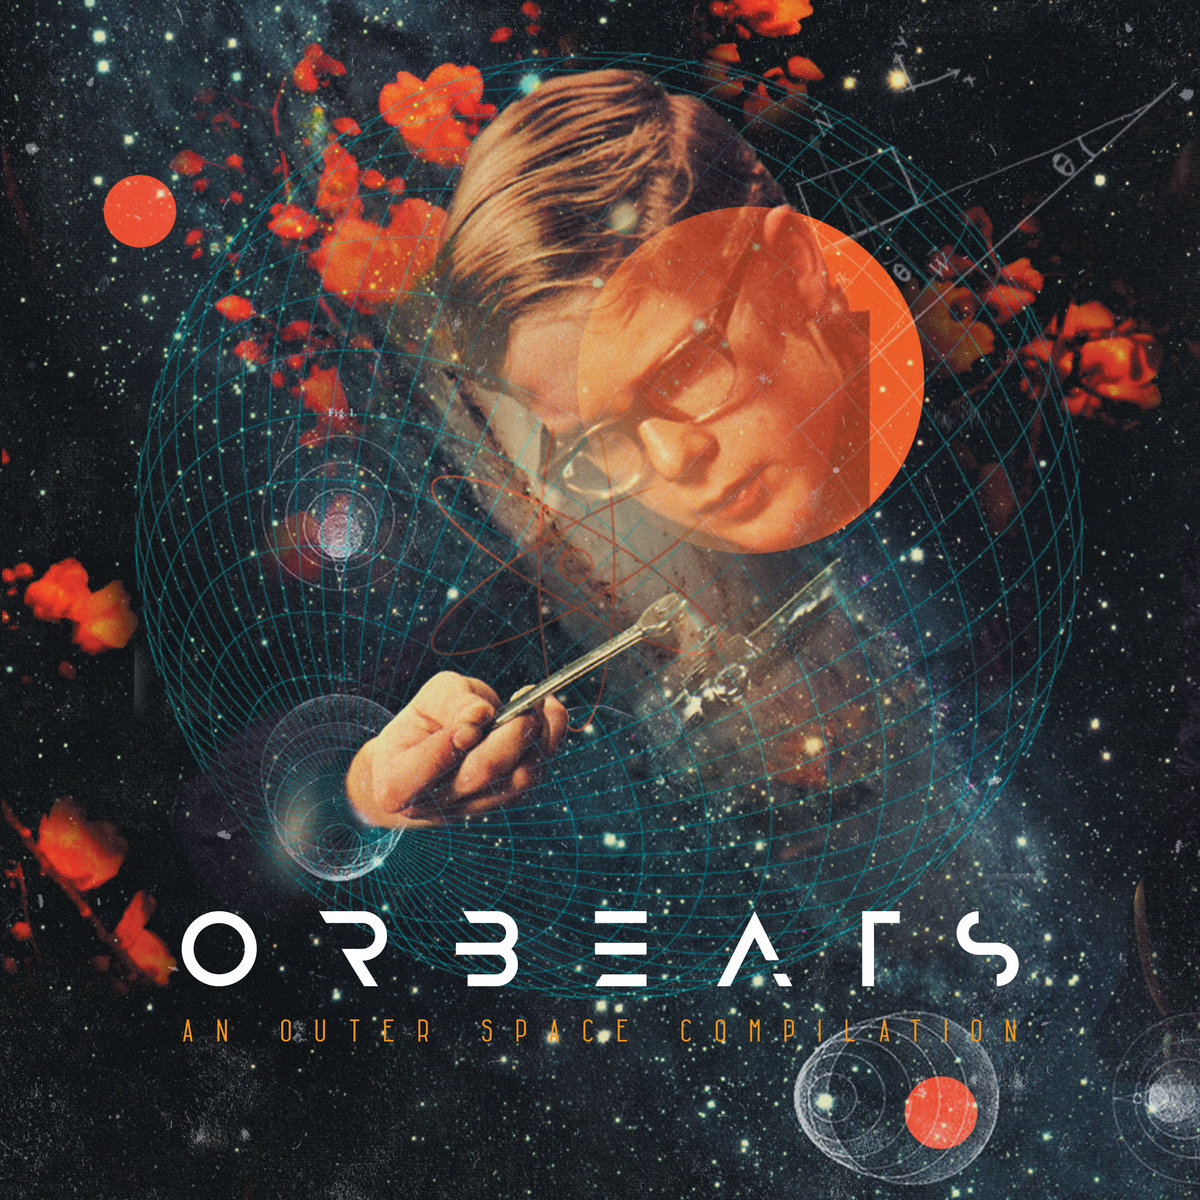 Melting-Records-Orbeats